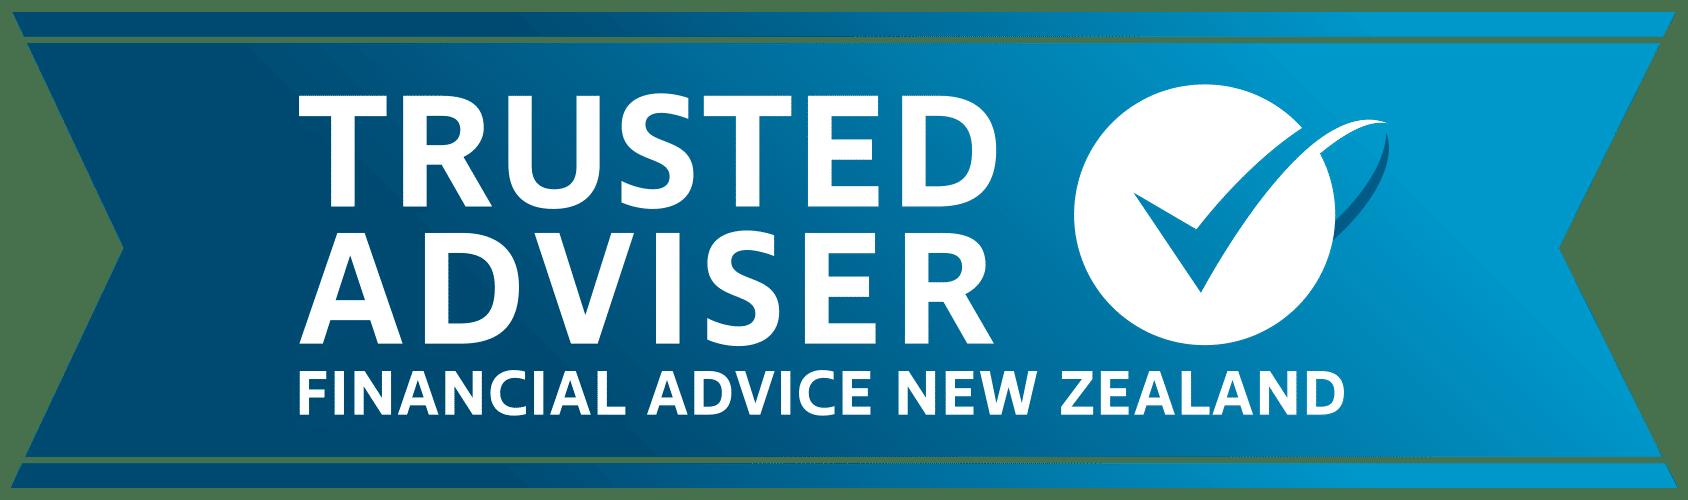 Trusted Advisor Financial Services logo